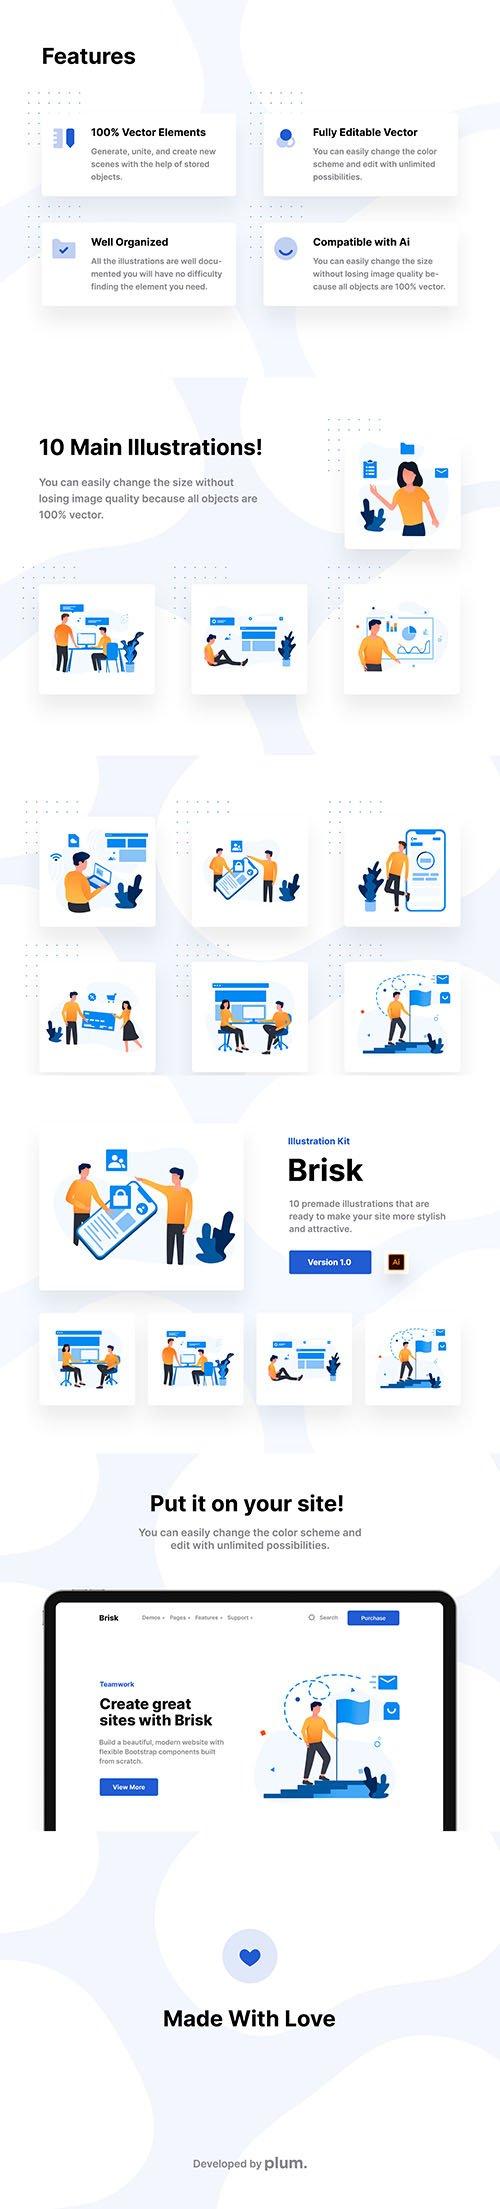 Brisk - Teamwork Illustration Kit